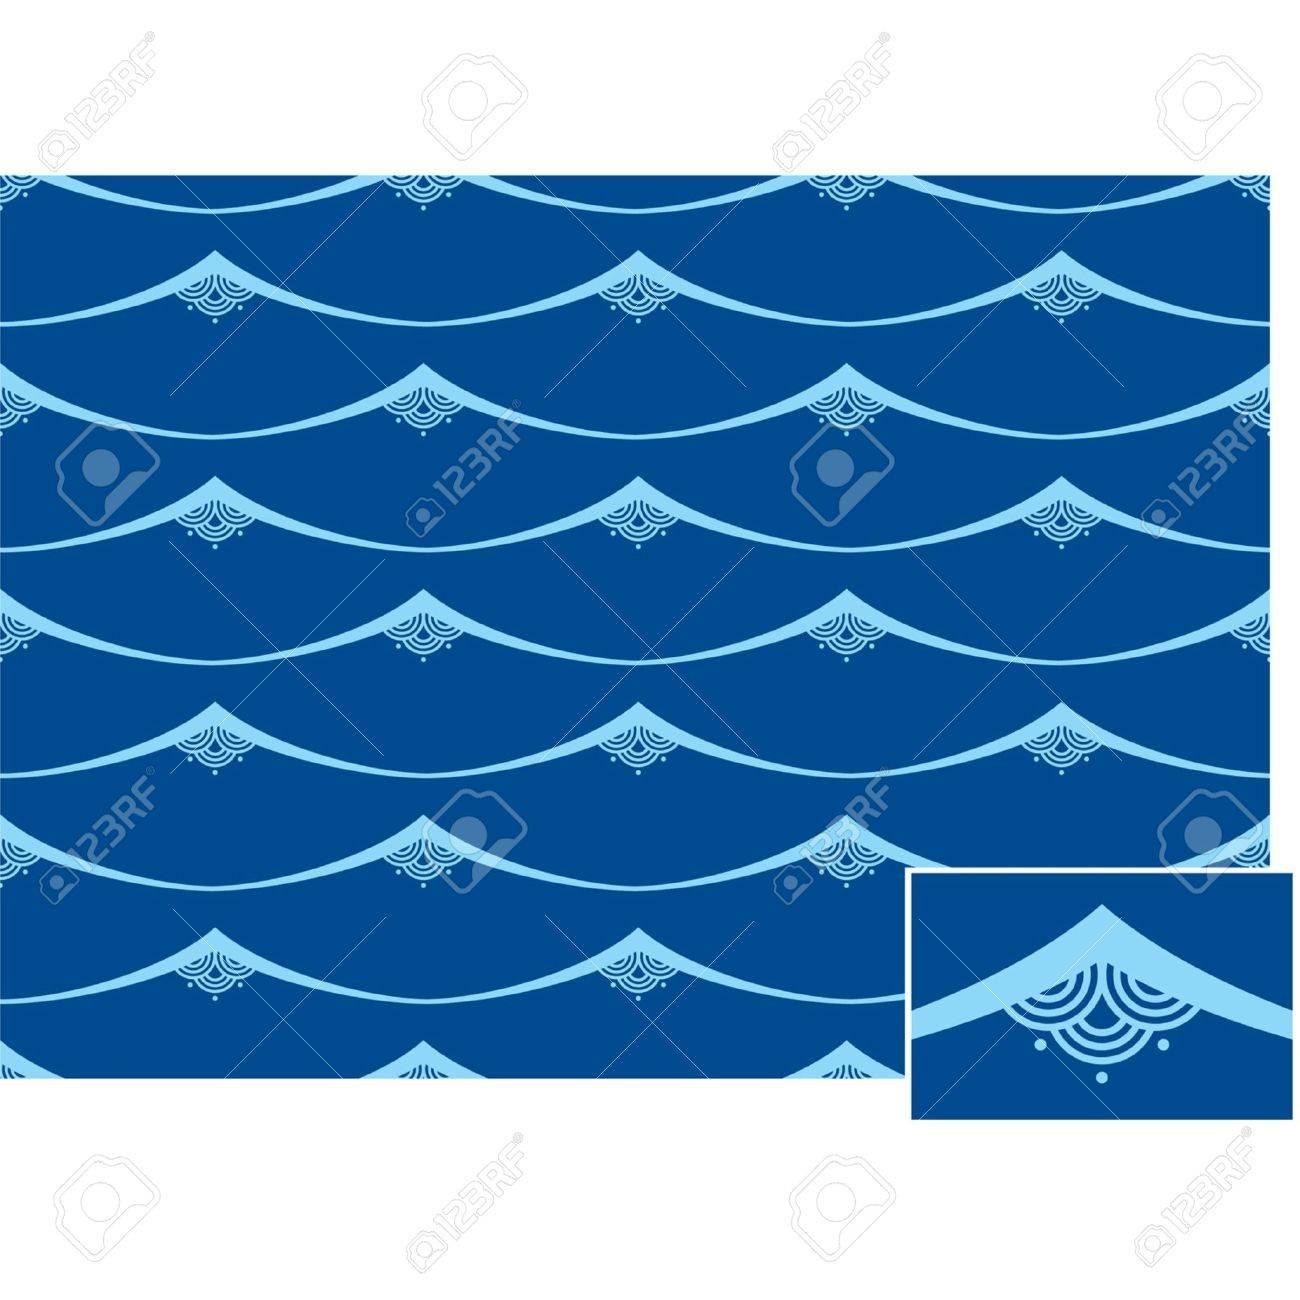 Seamless Oriental Waves Tile (background pattern wallpaper) Stock Vector - 10762941